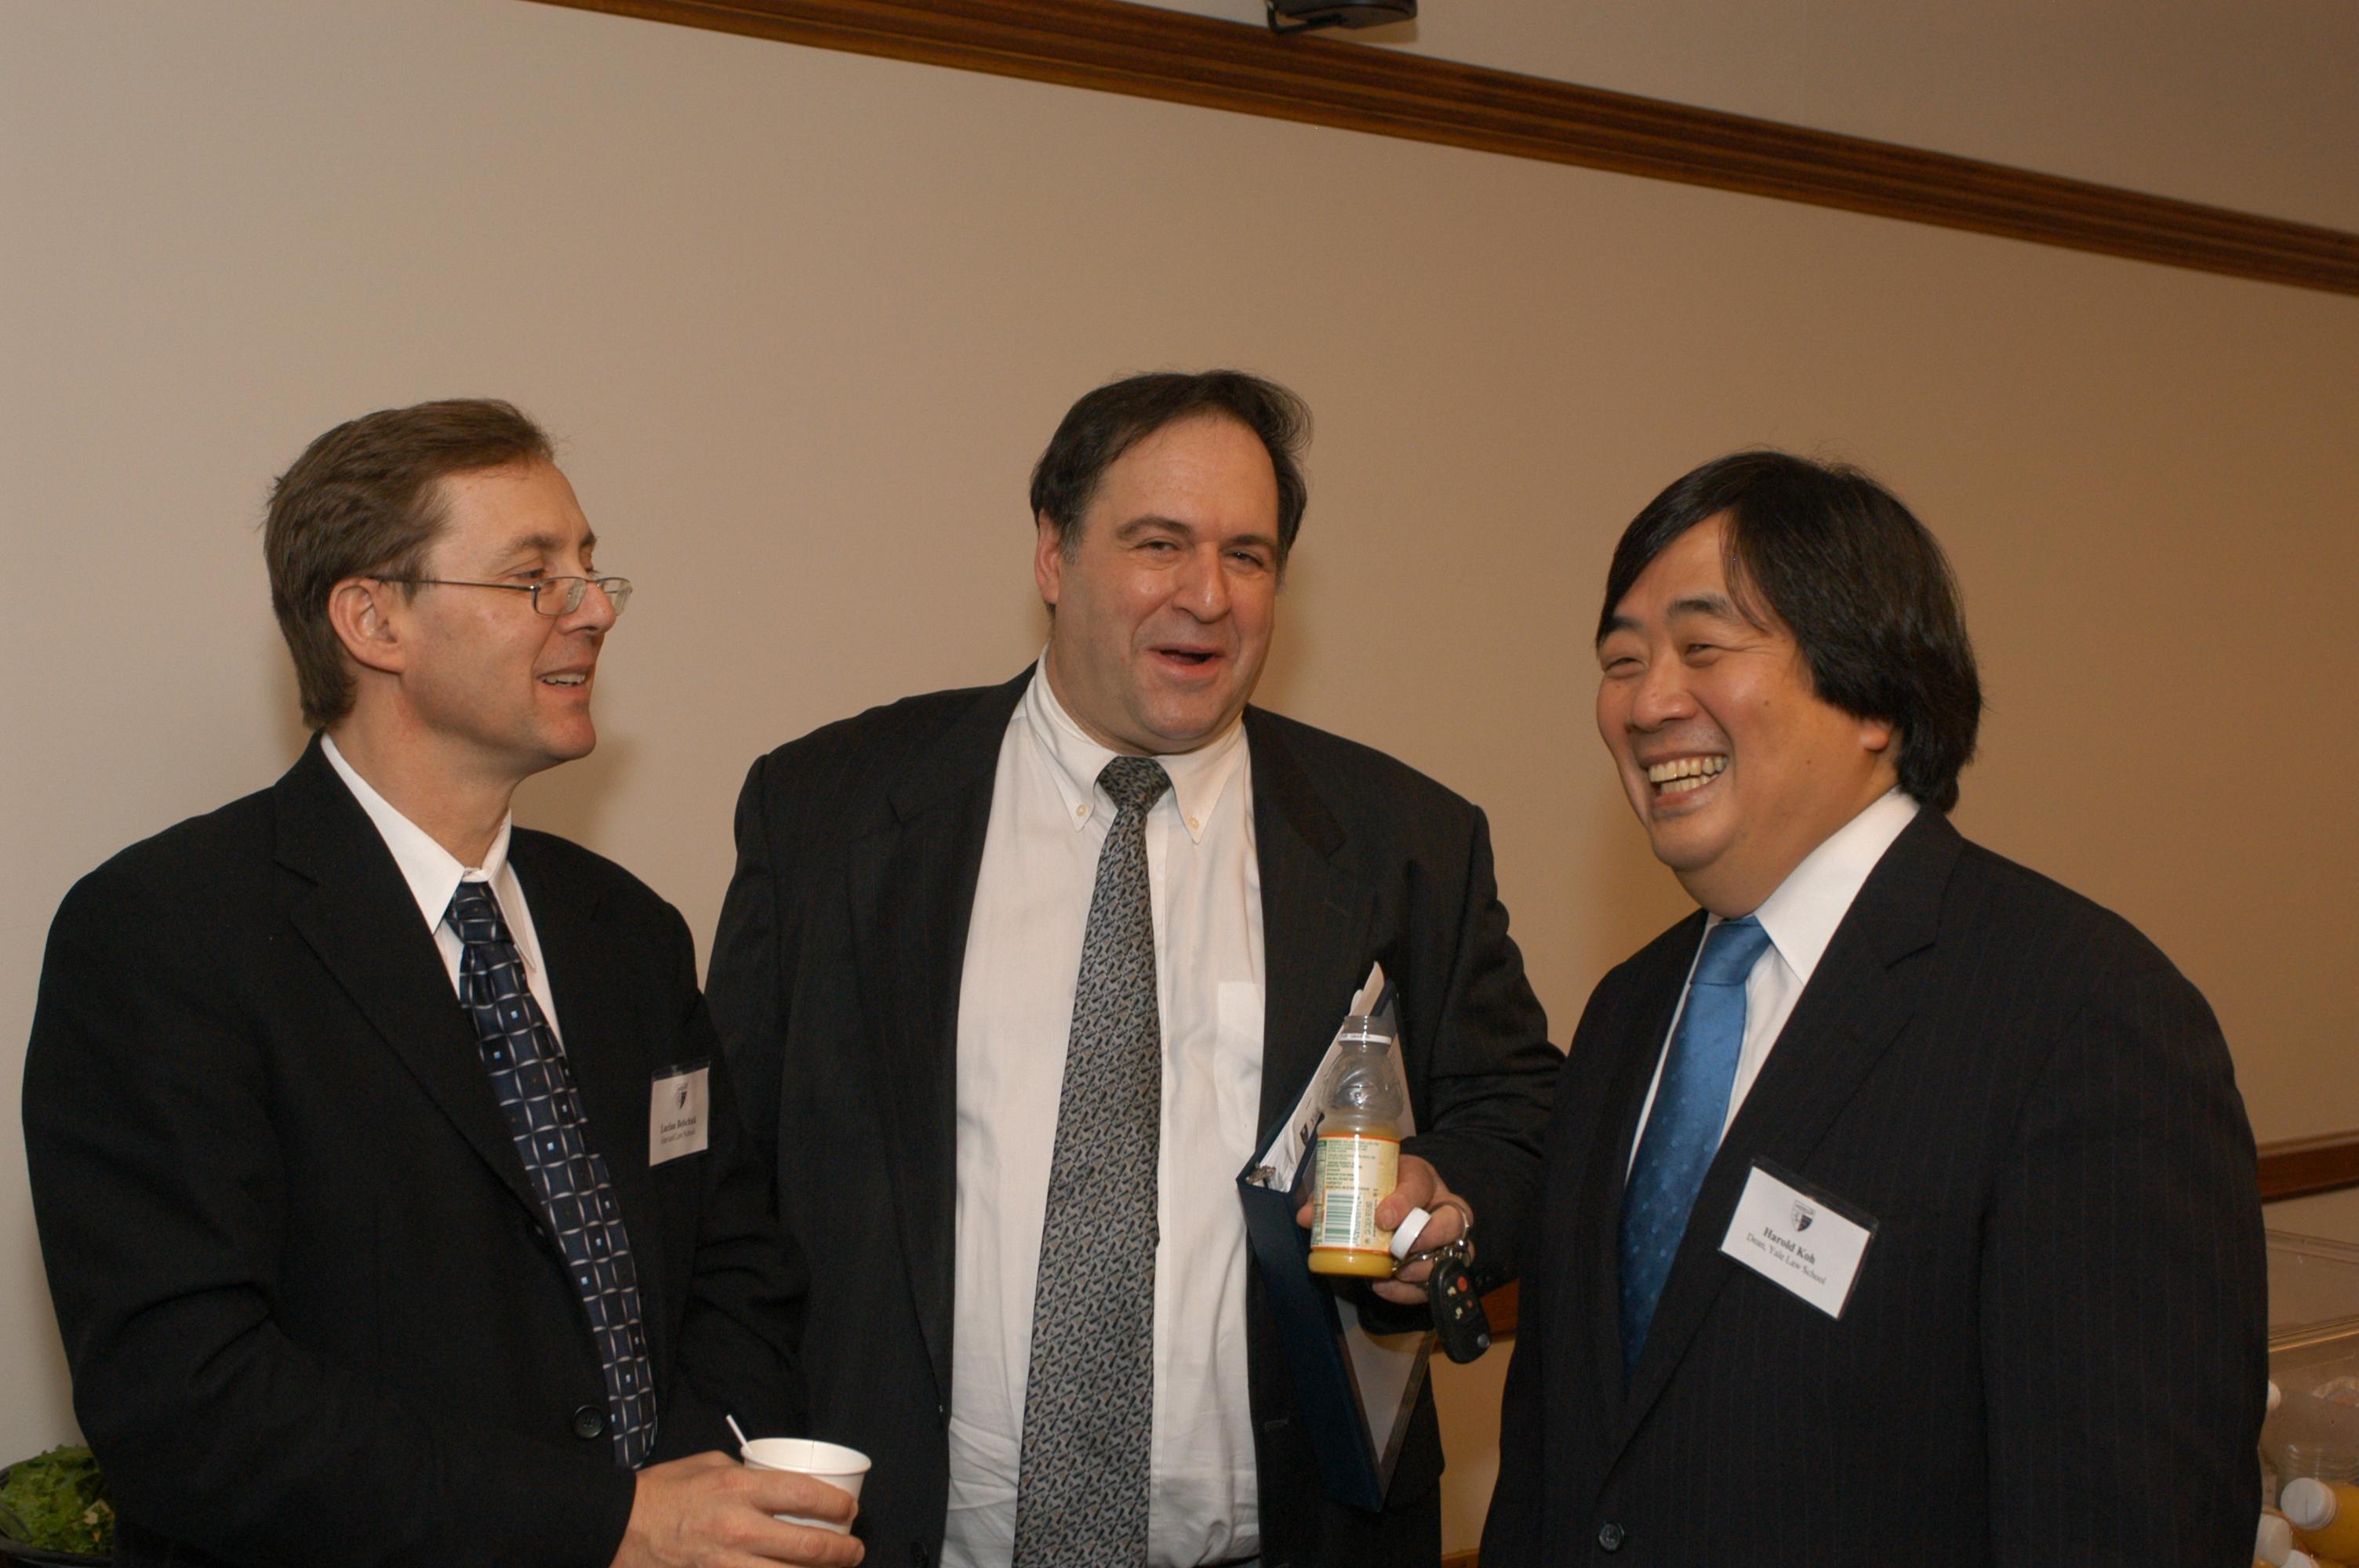 Harvard Law Prof. Lucian Bebchuk, Yale SOM Prof. Jeffrey Sonnenfeld, and YLS Dean Harold Hongju Koh